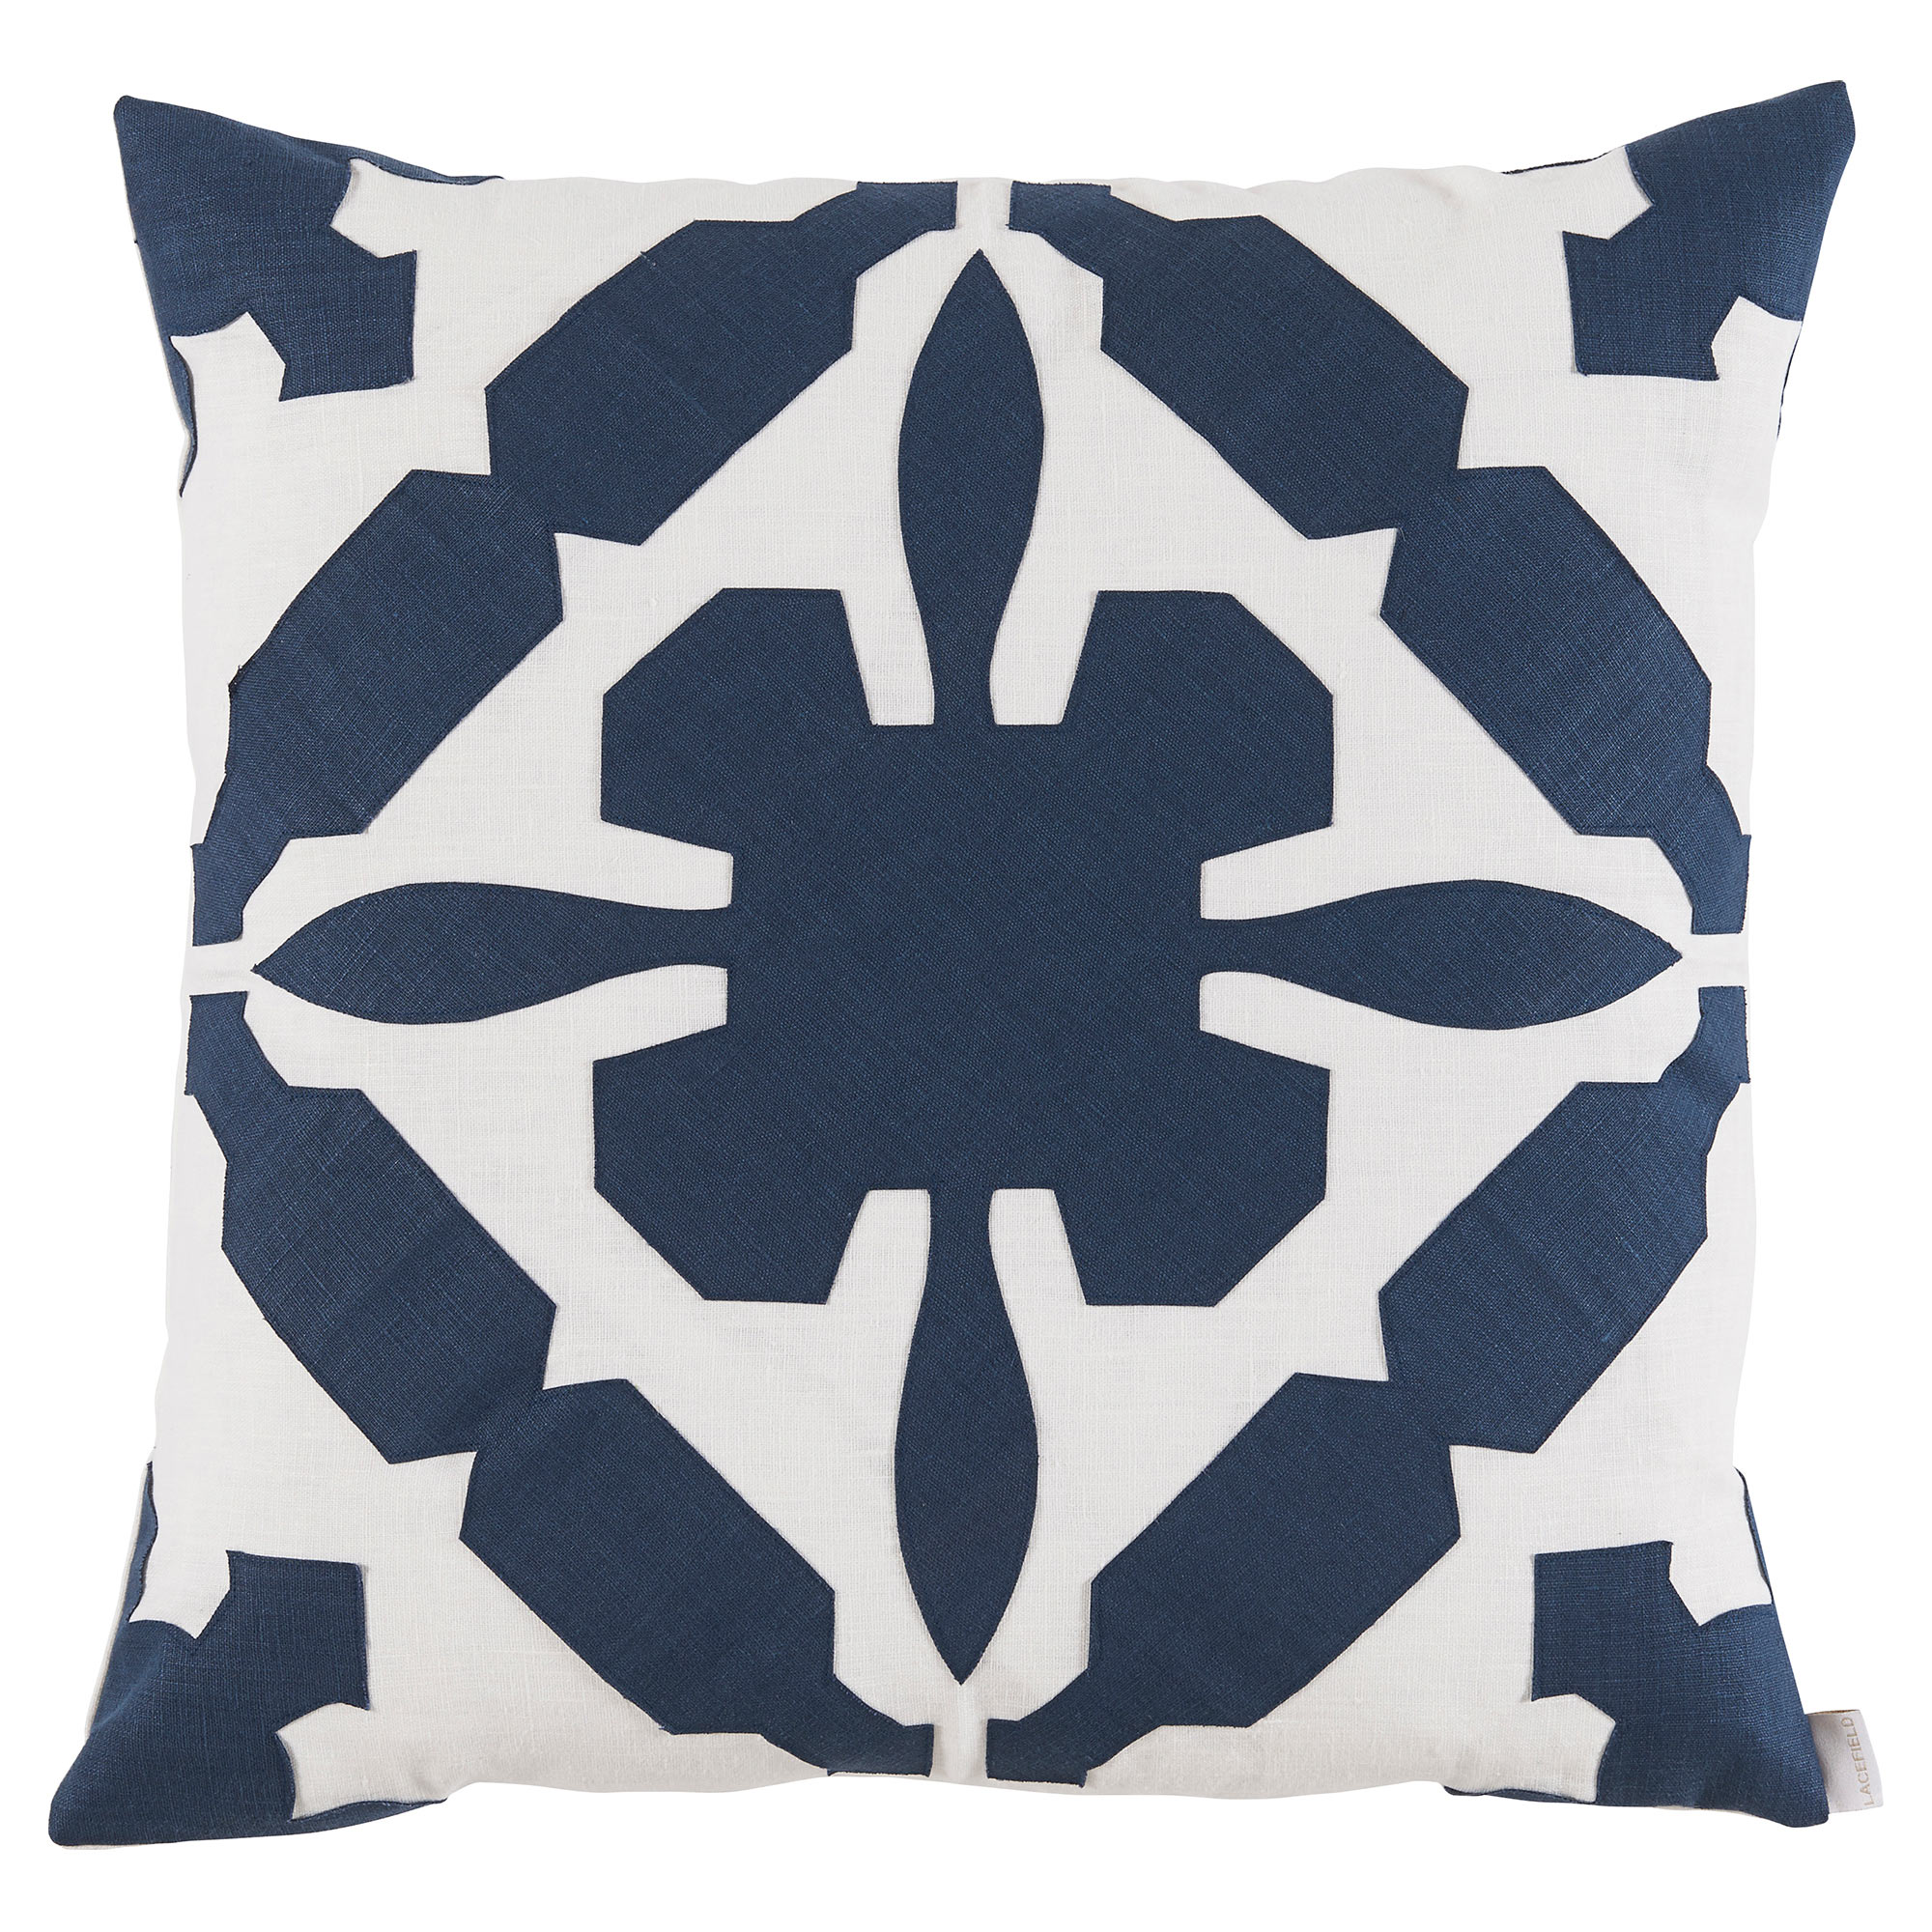 Pasha Modern Applique White Linen Navy Pillow - 22x22